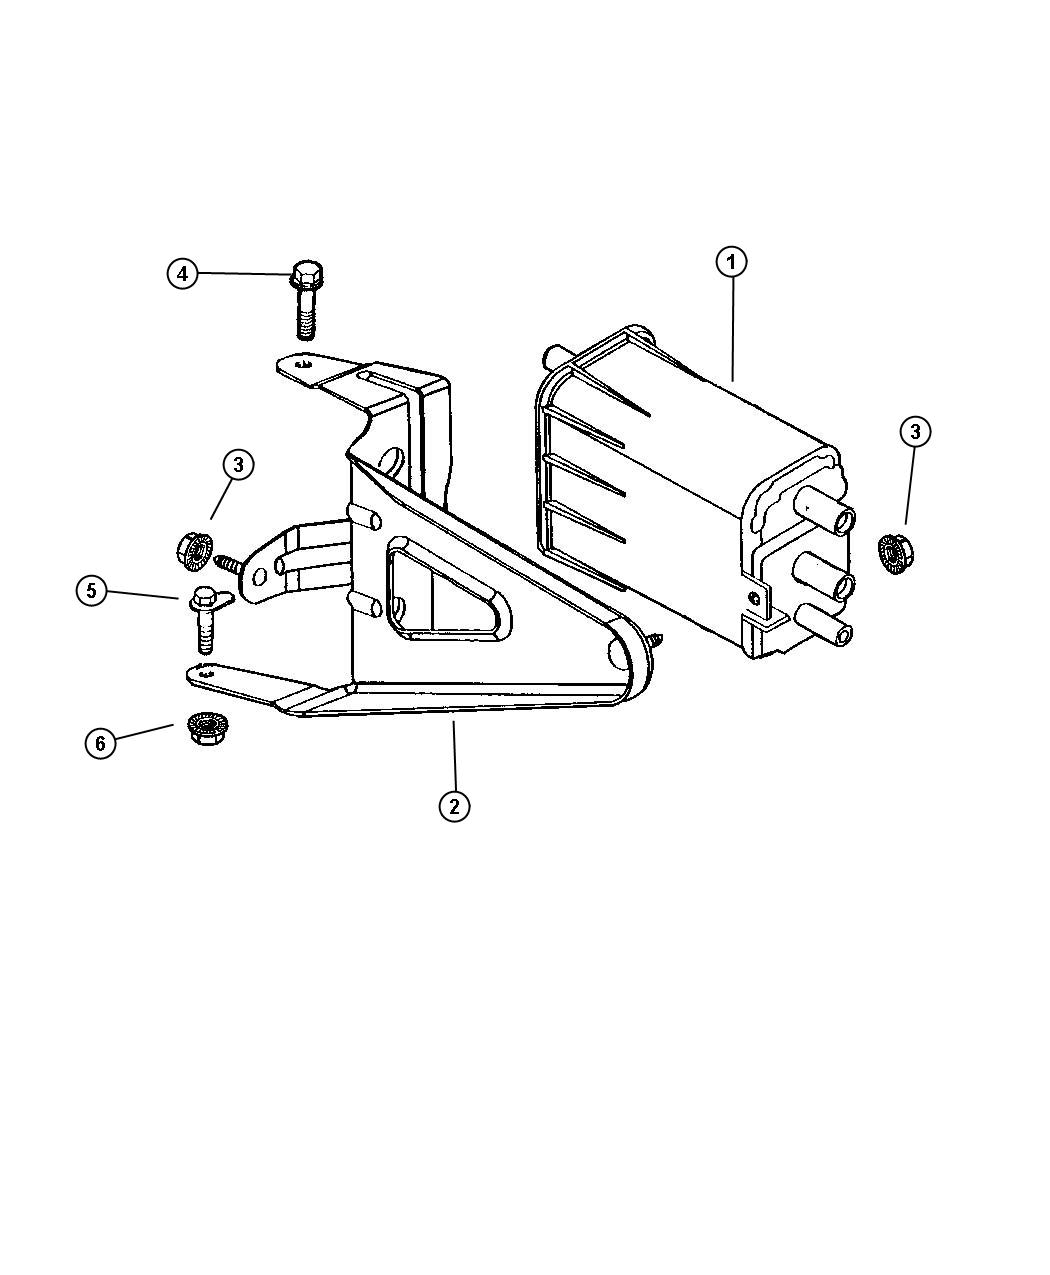 Dodge Dakota Canister Vapor Gallonfuel Enginep